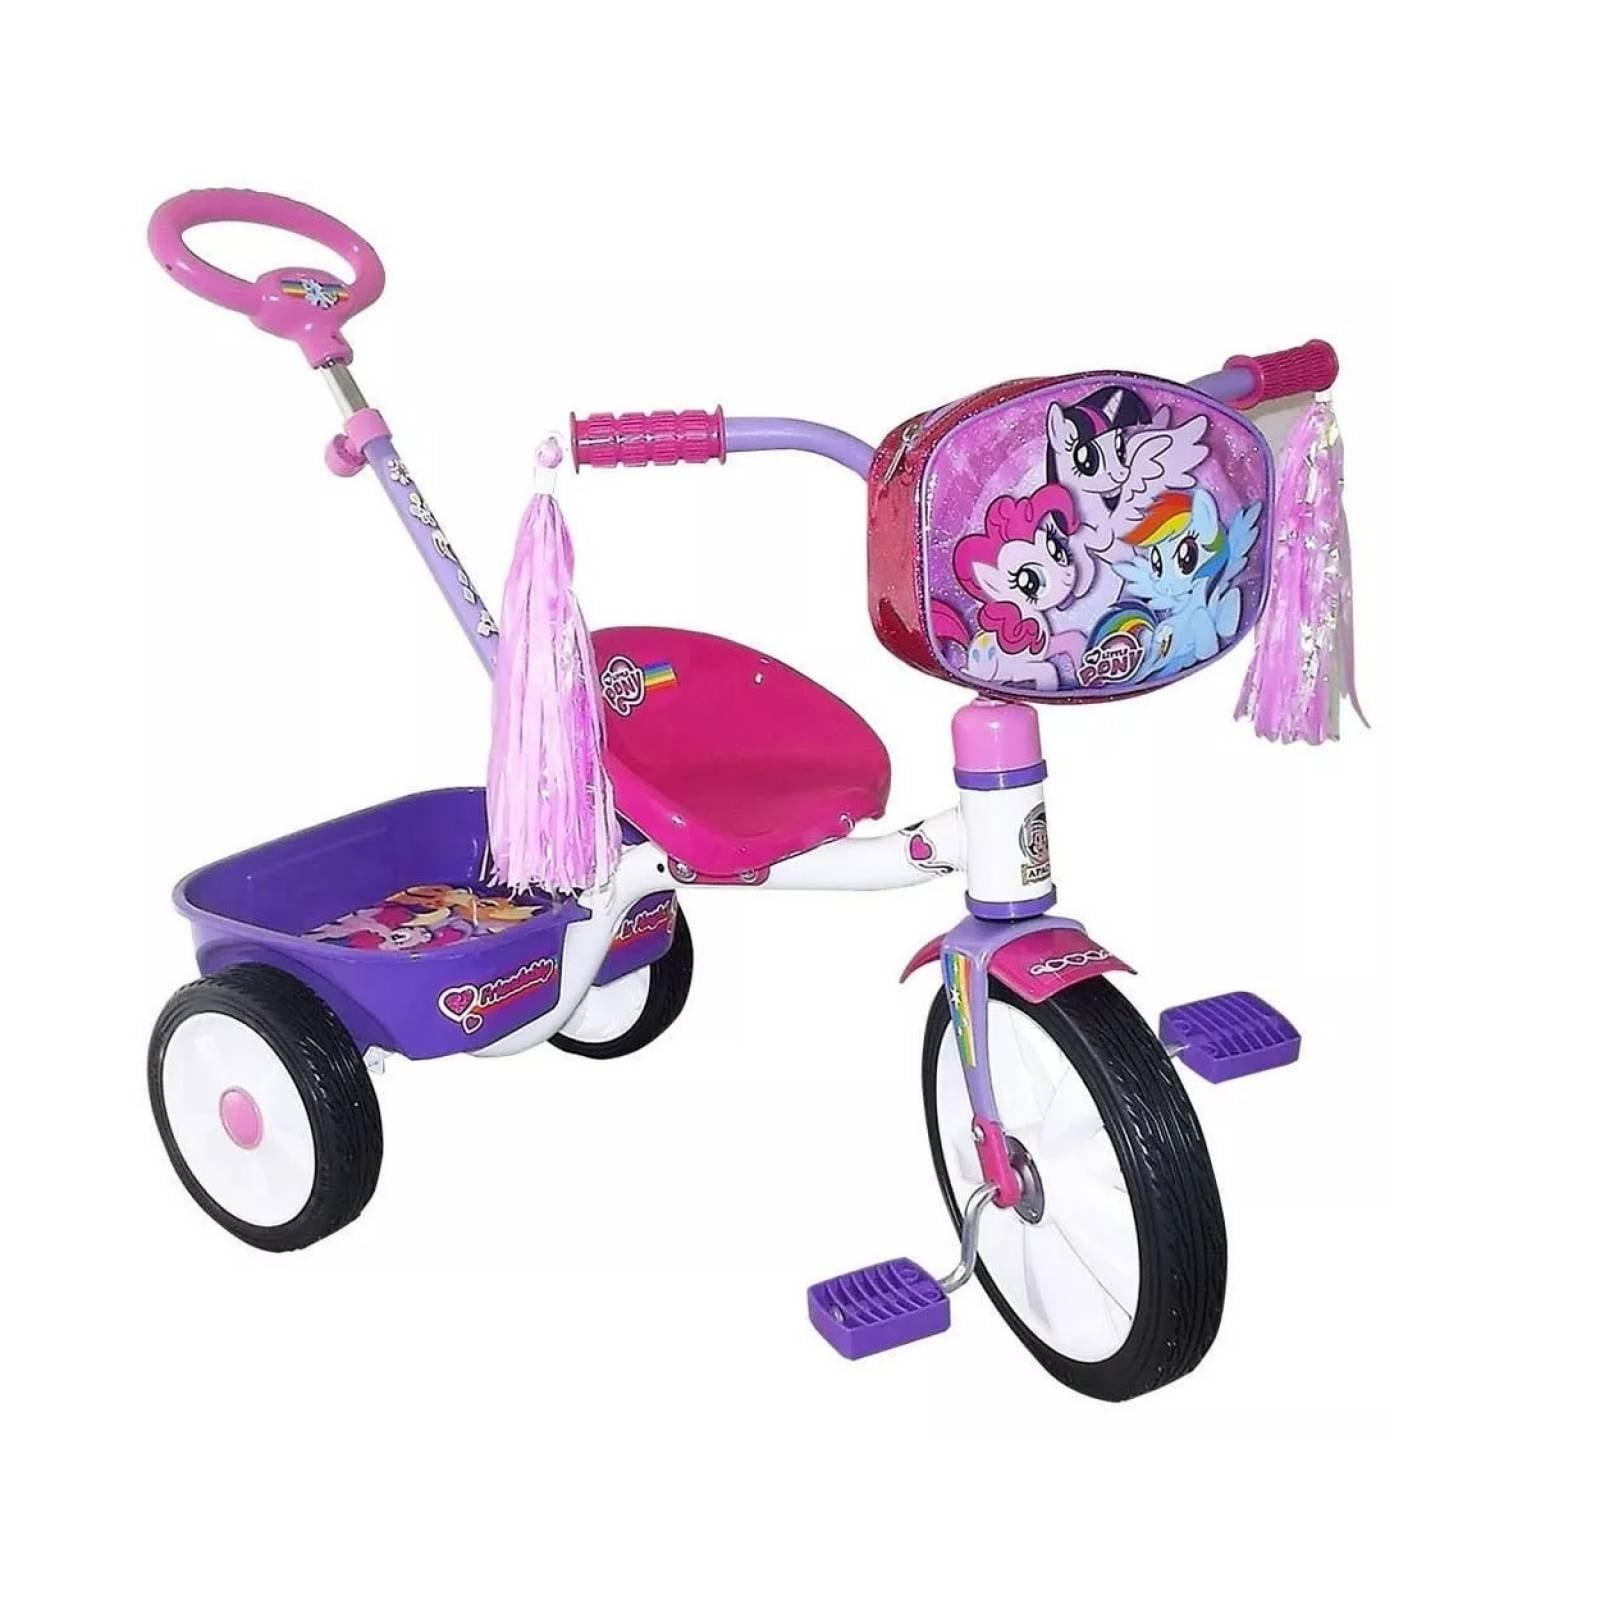 Triciclo con barra de empuje apache my little pony r12 nina